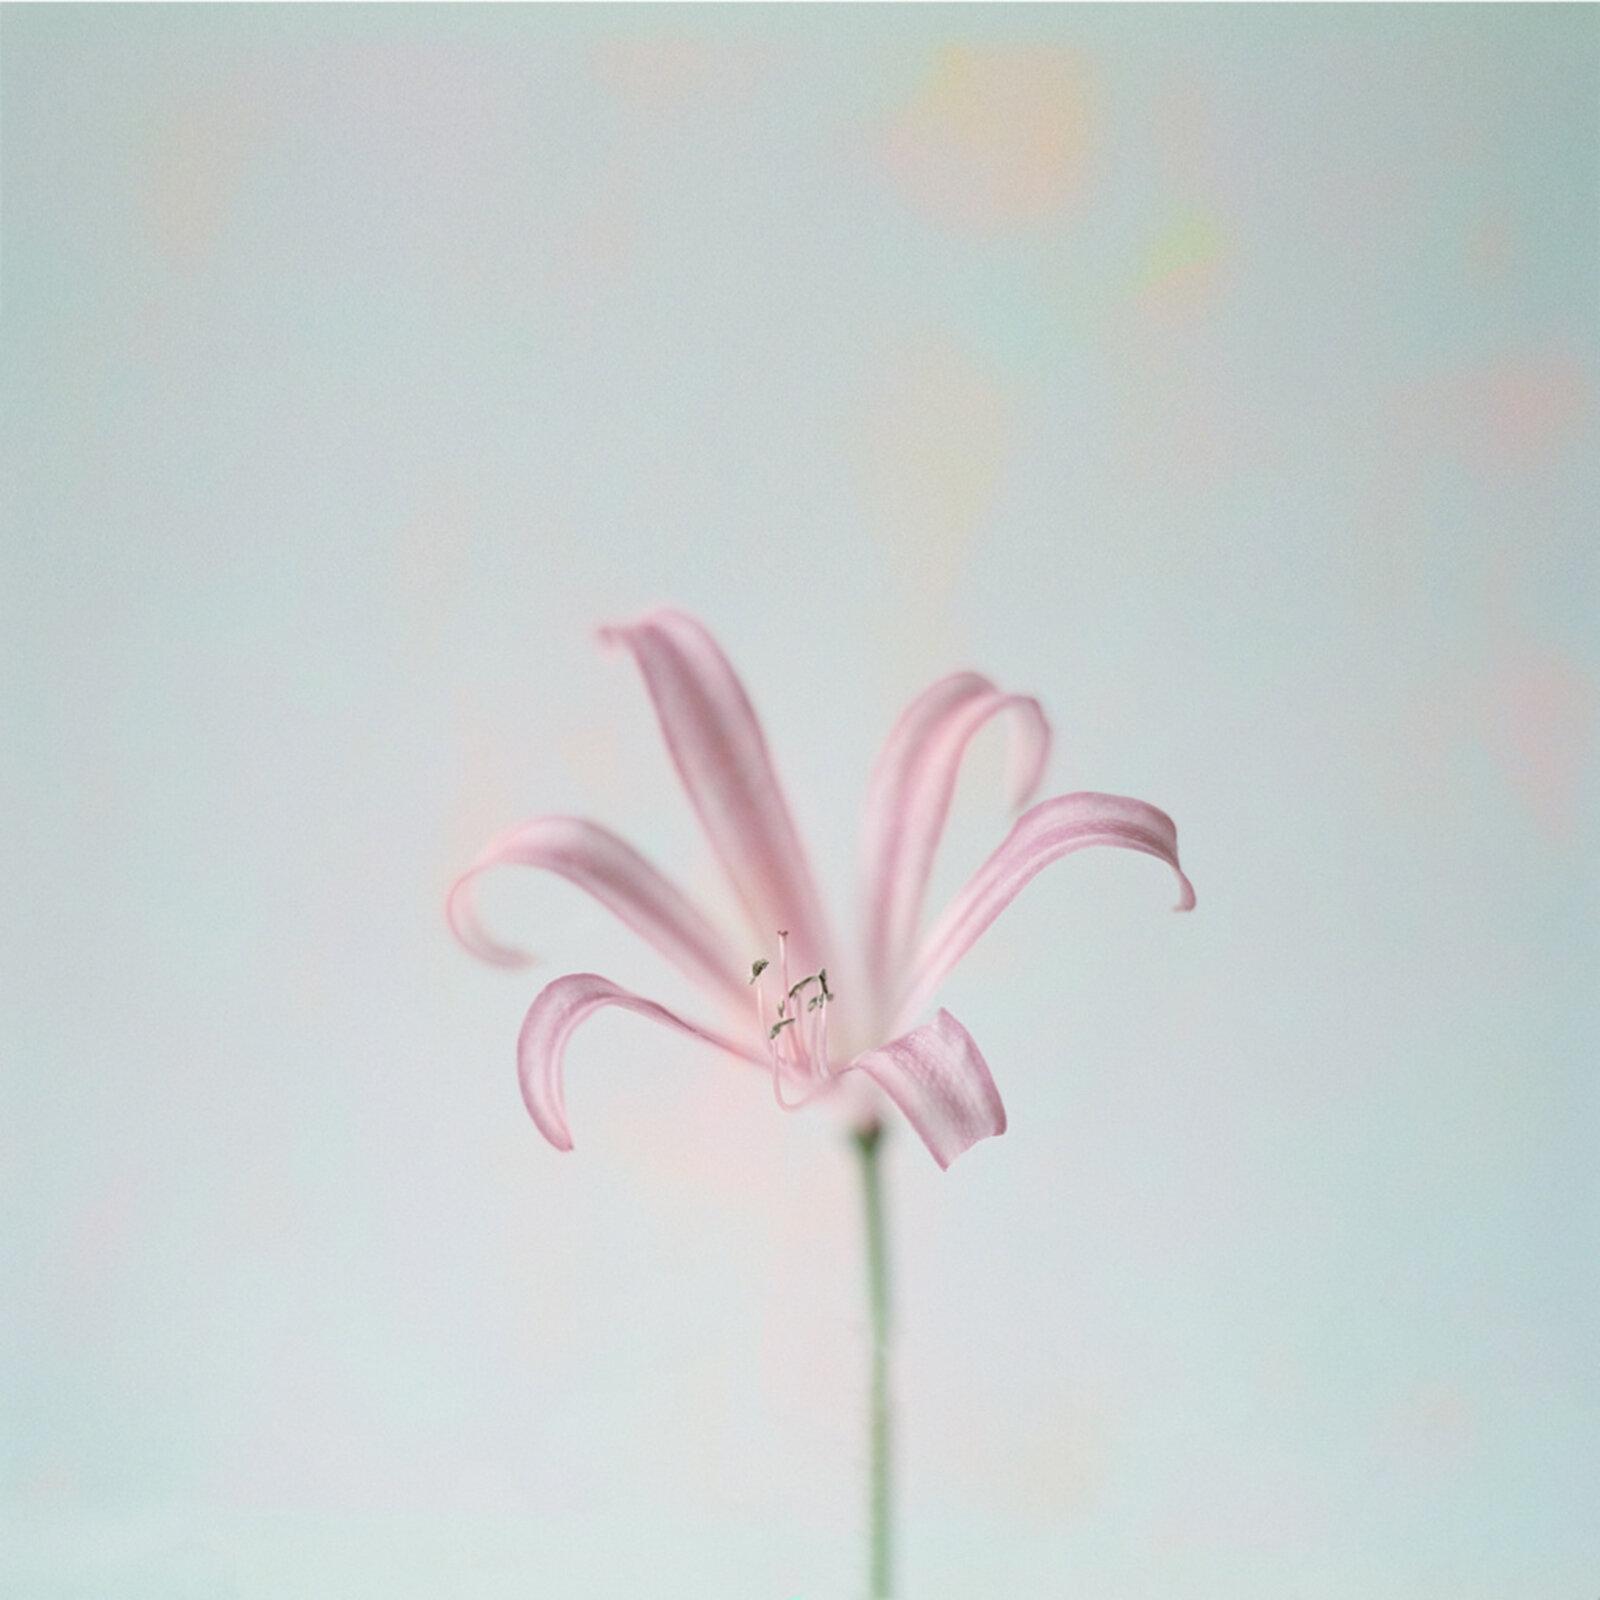 Floral image shot on my beloved Mamiya medium format film camera + a digital overlay